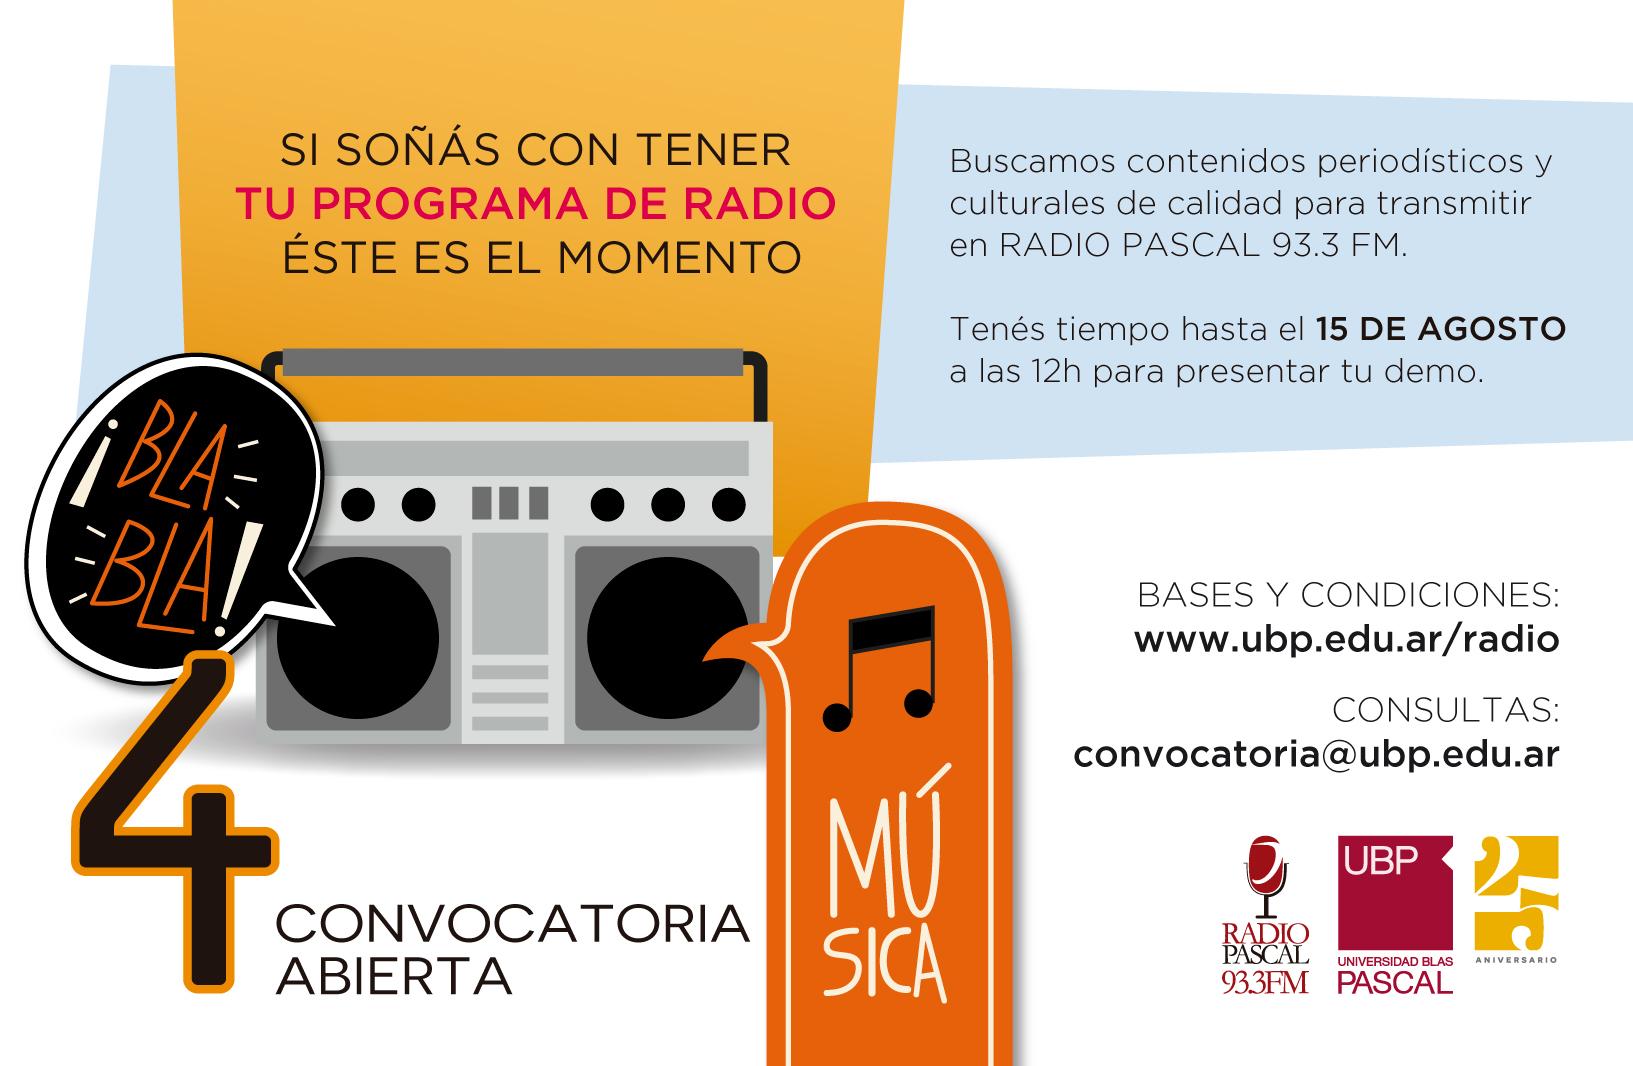 FM 93.3: ¿querés dirigir un programa de radio?